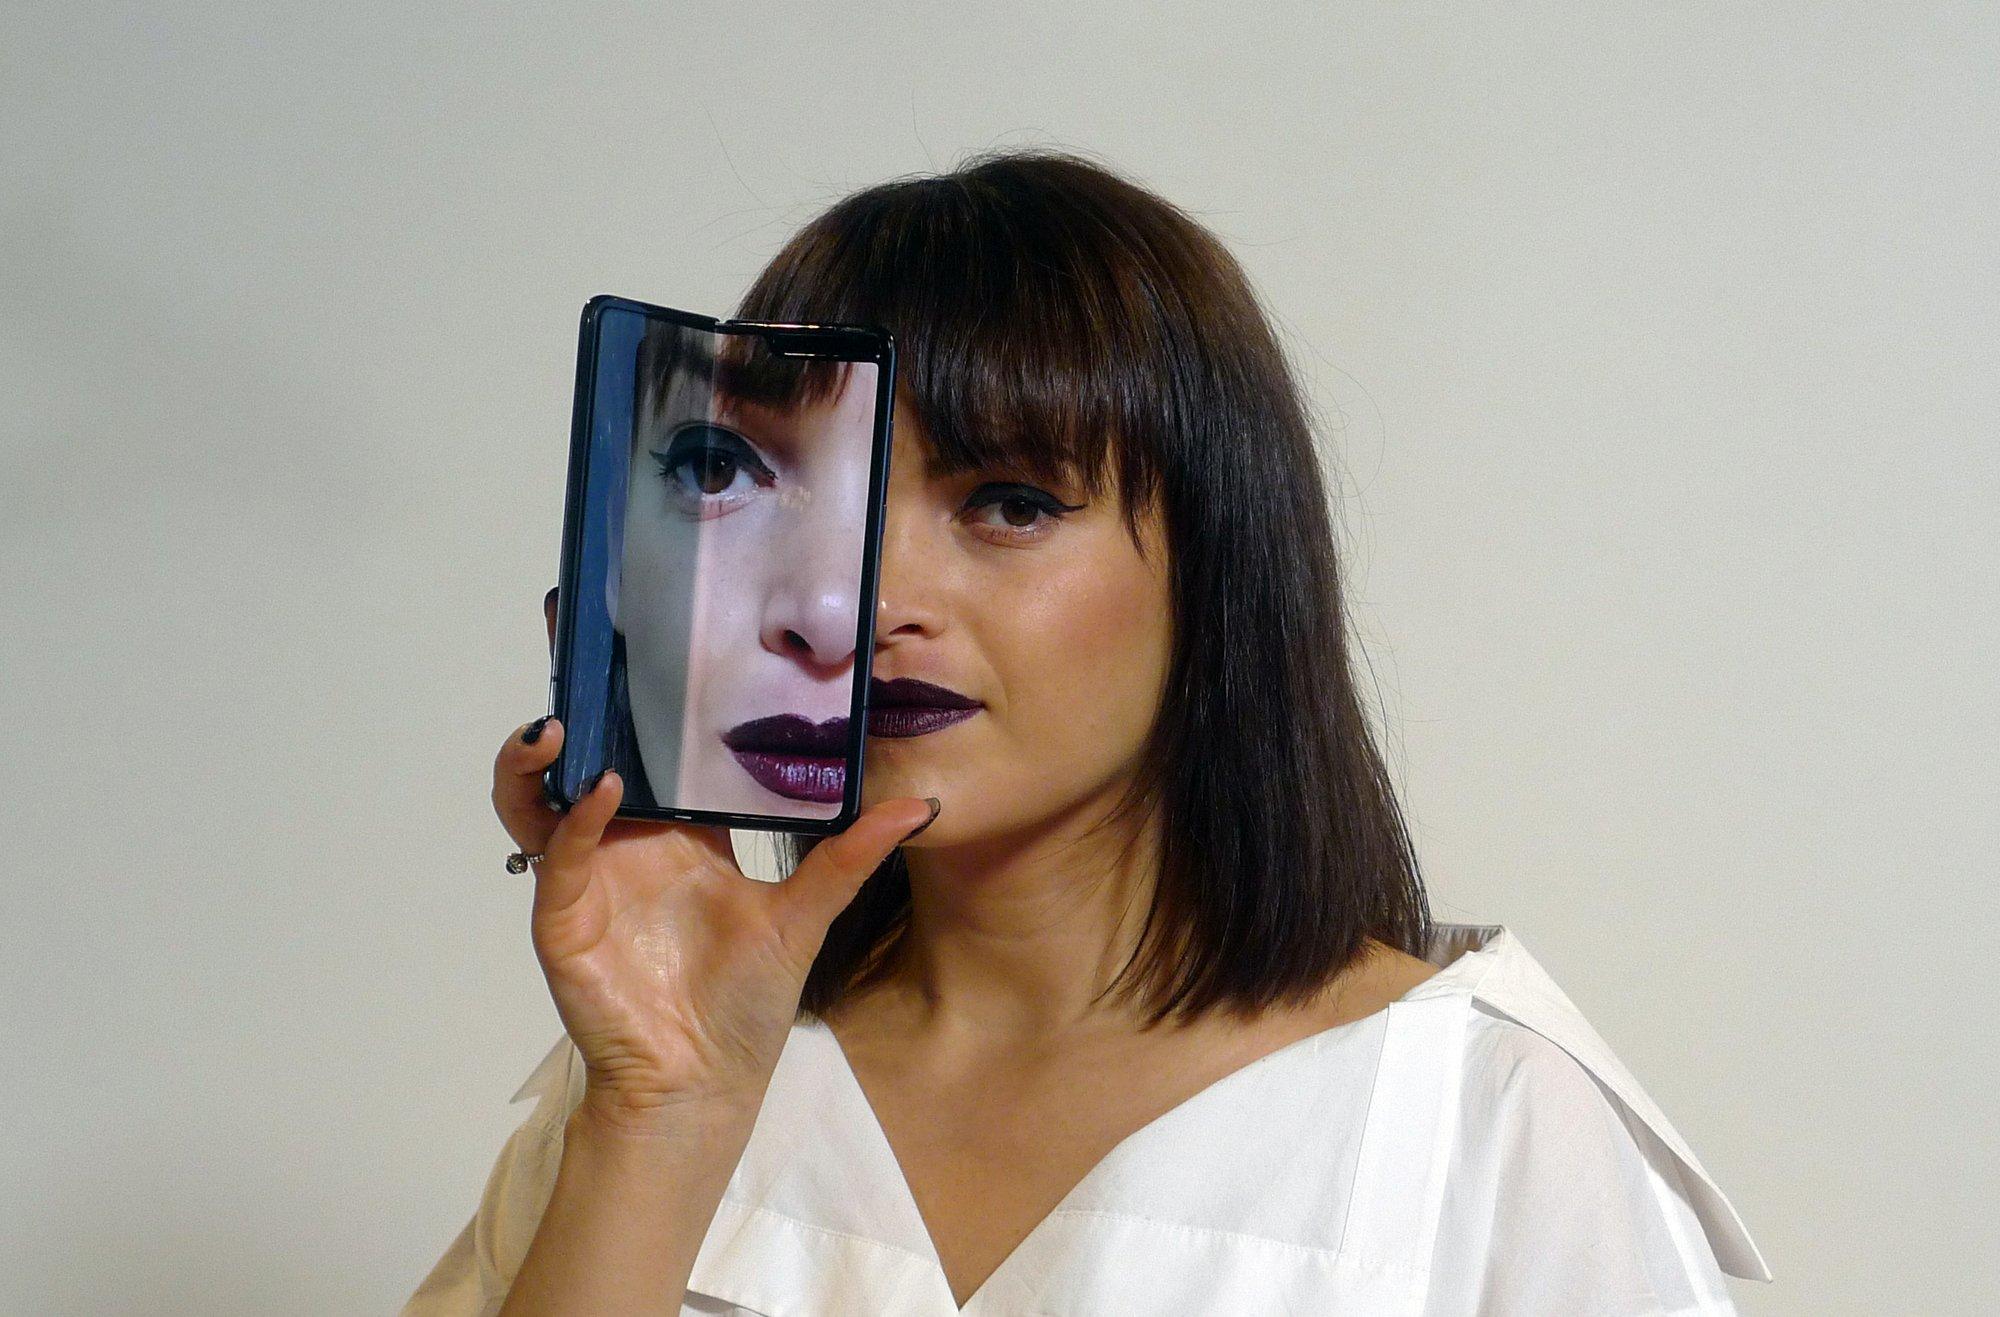 New Samsung handset: Innovation hinges on folding screen